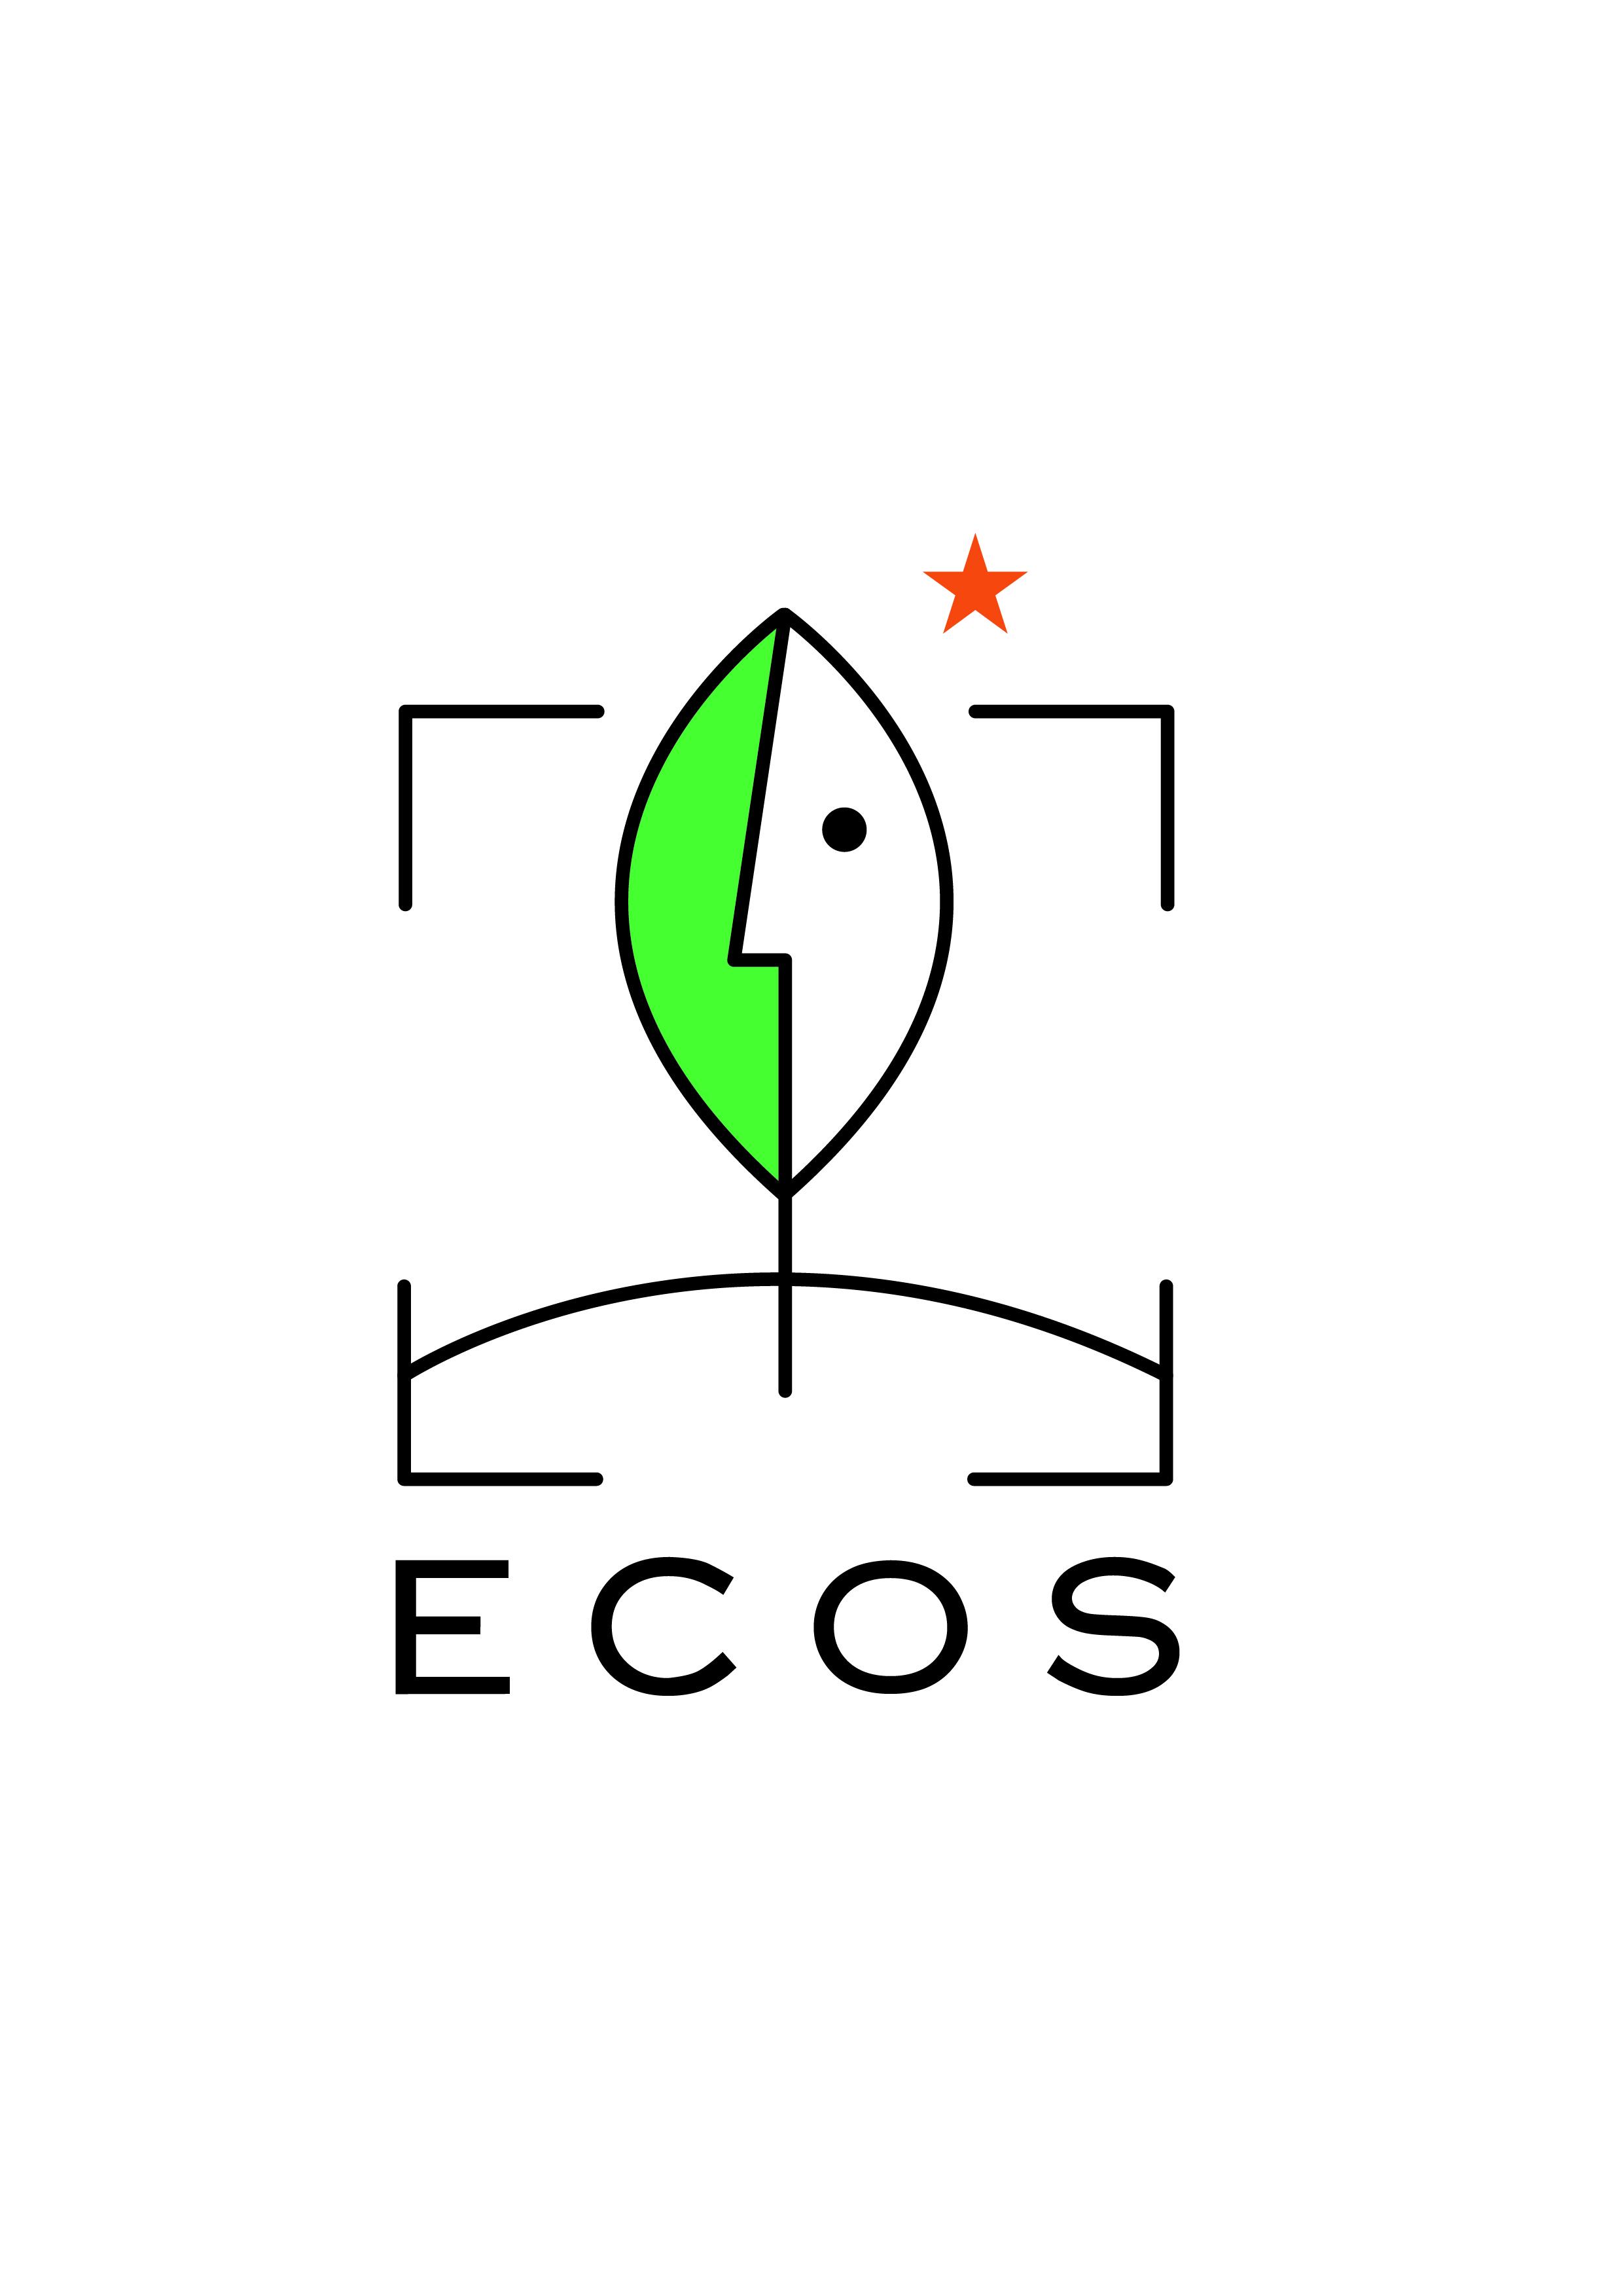 ECOS logo